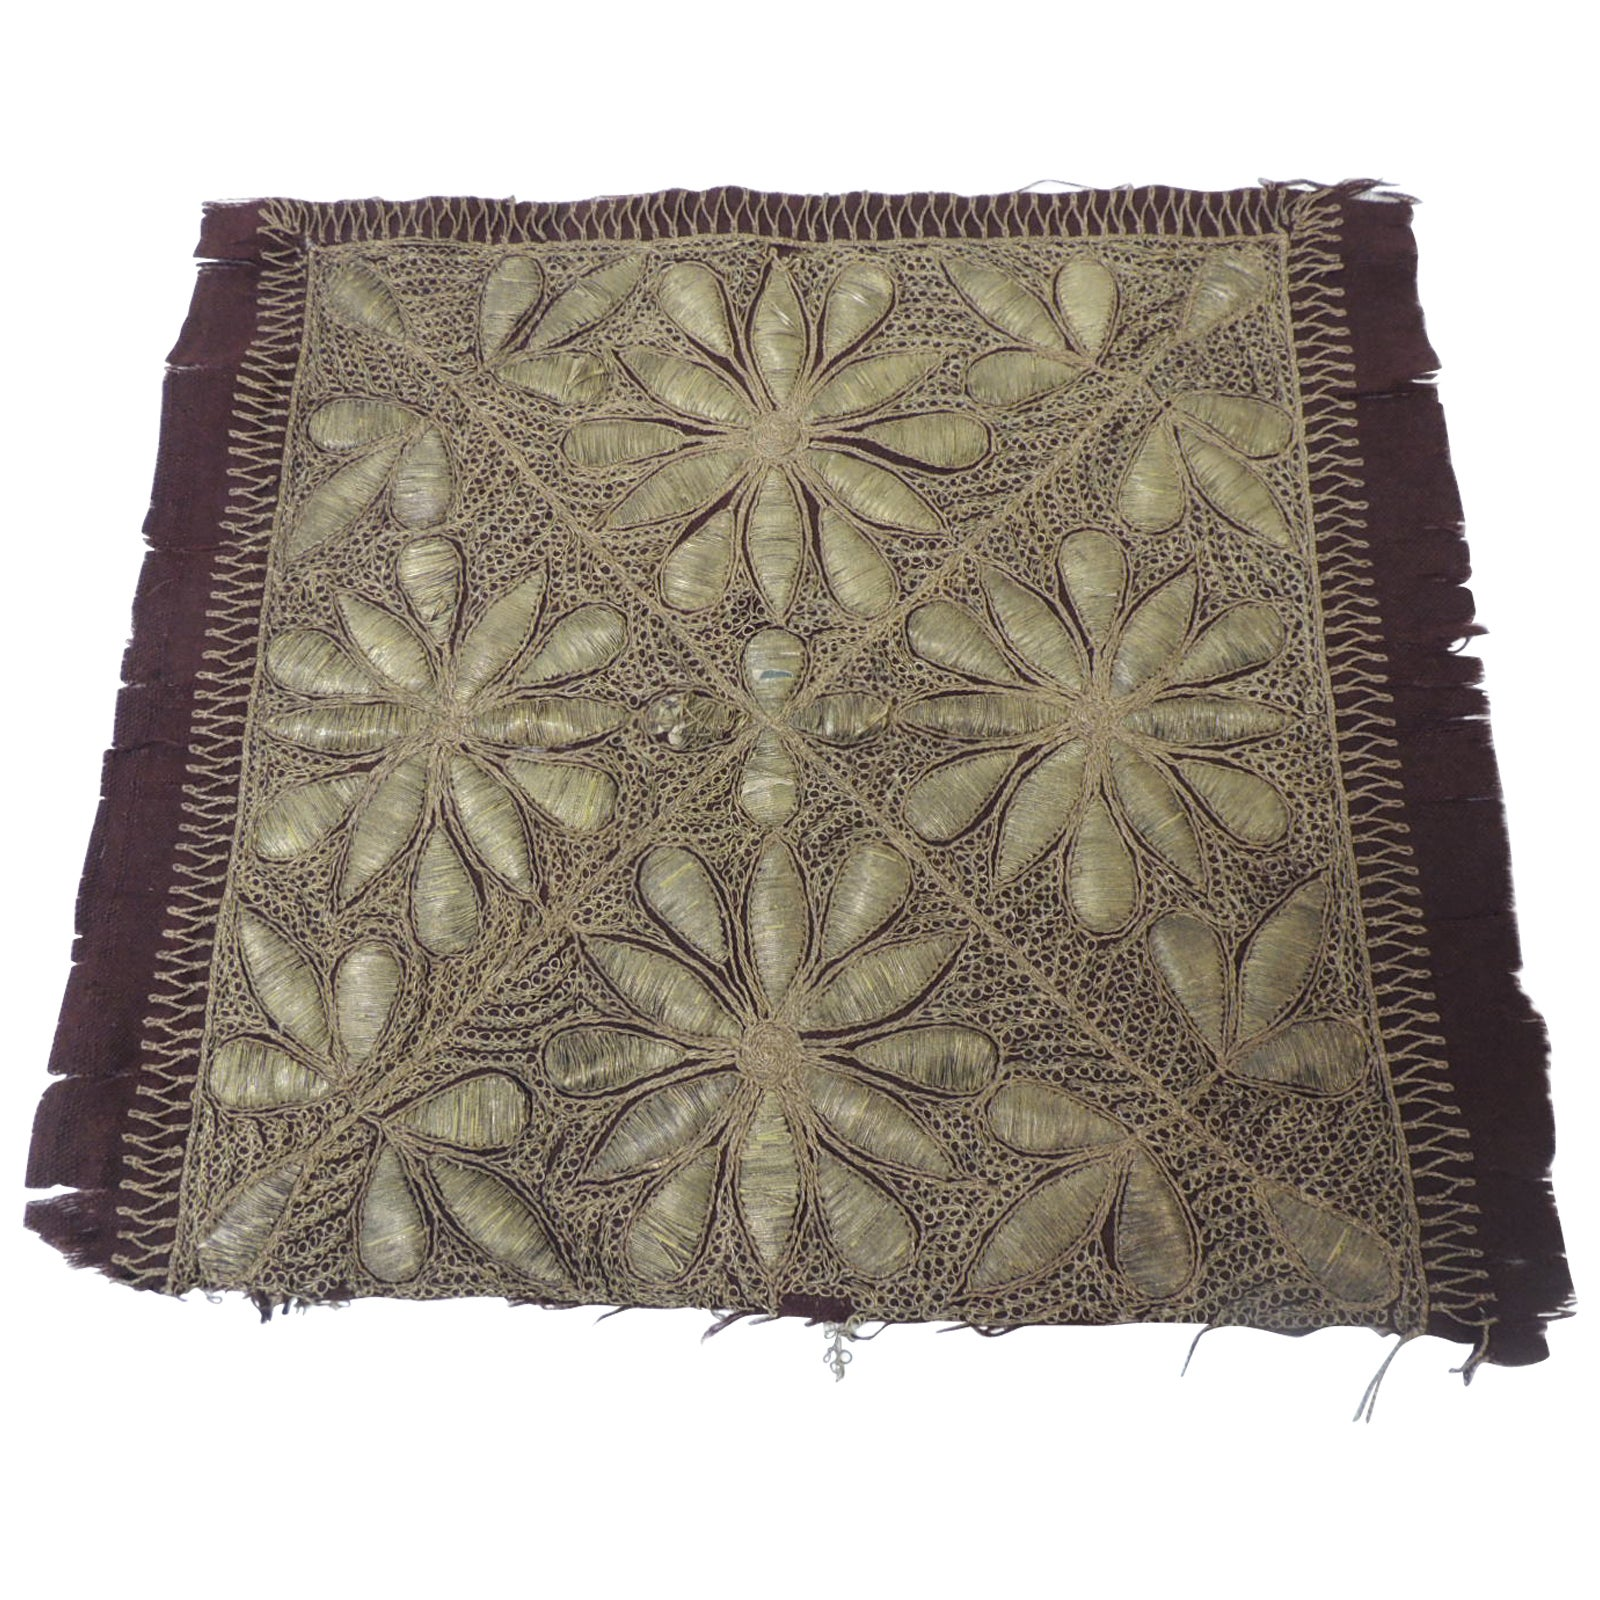 19th c. Persian Ottoman Empire Gold Metallic Threads Embroidered Textile